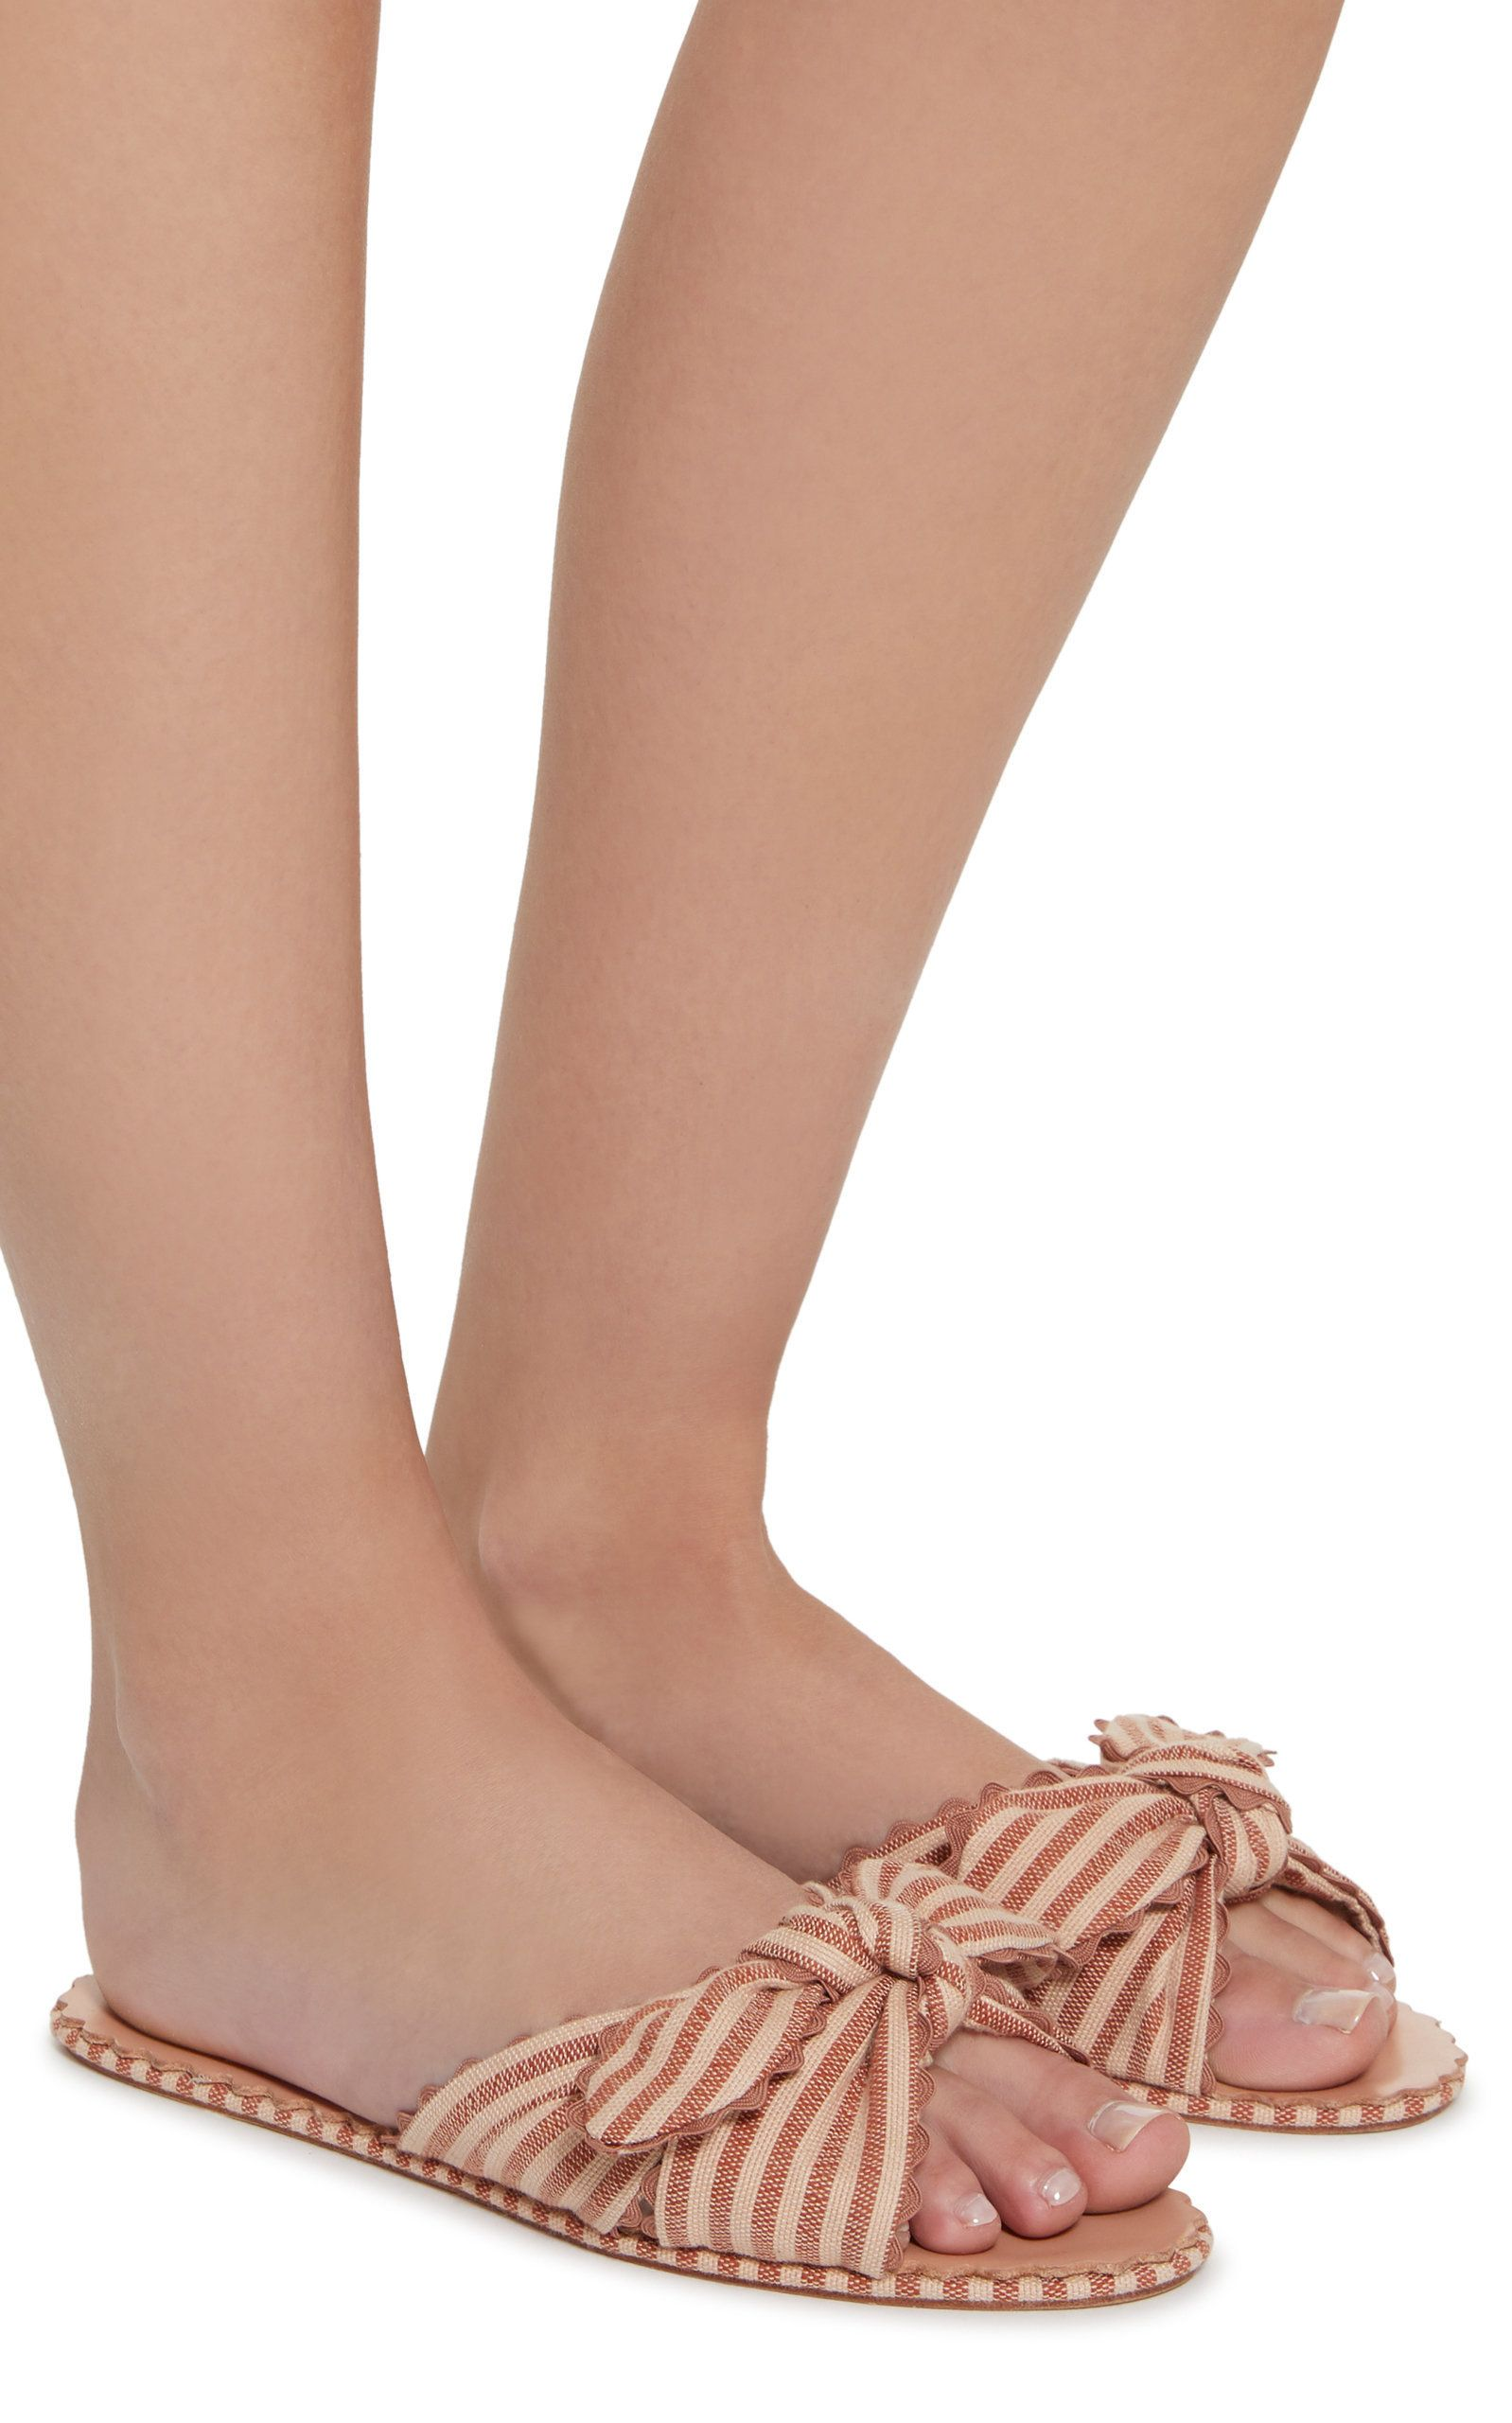 cbdb848ca0f Shirley Stripe Slide | shop shoe ss18 | Loeffler randall ...